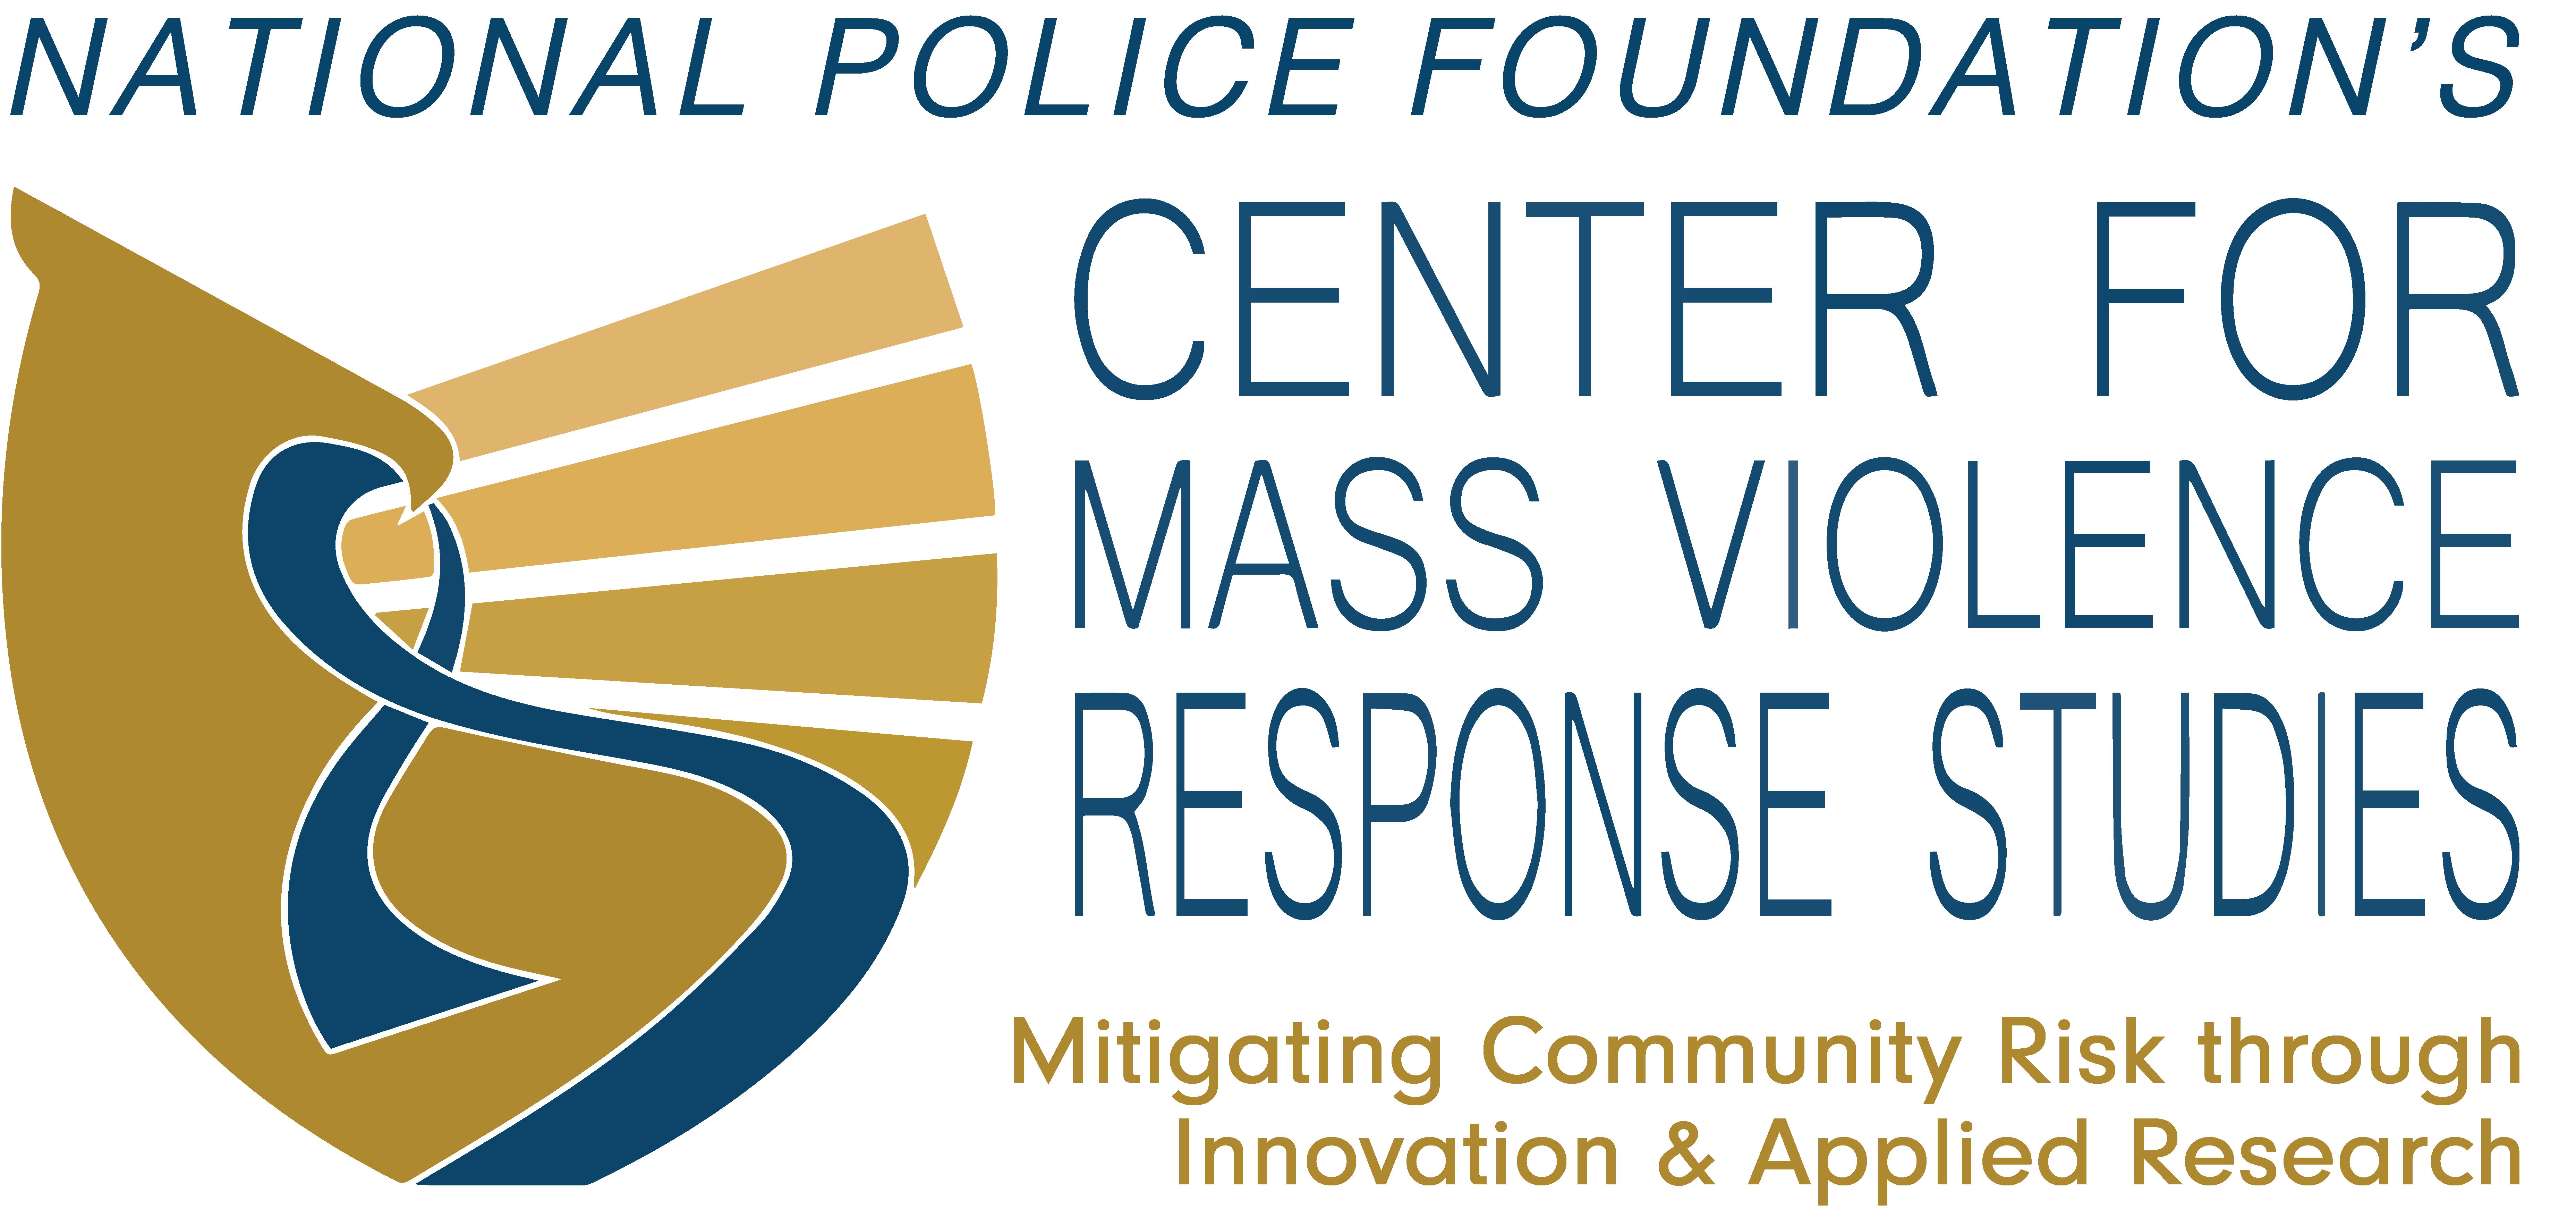 Center for Mass Violence Response Studies